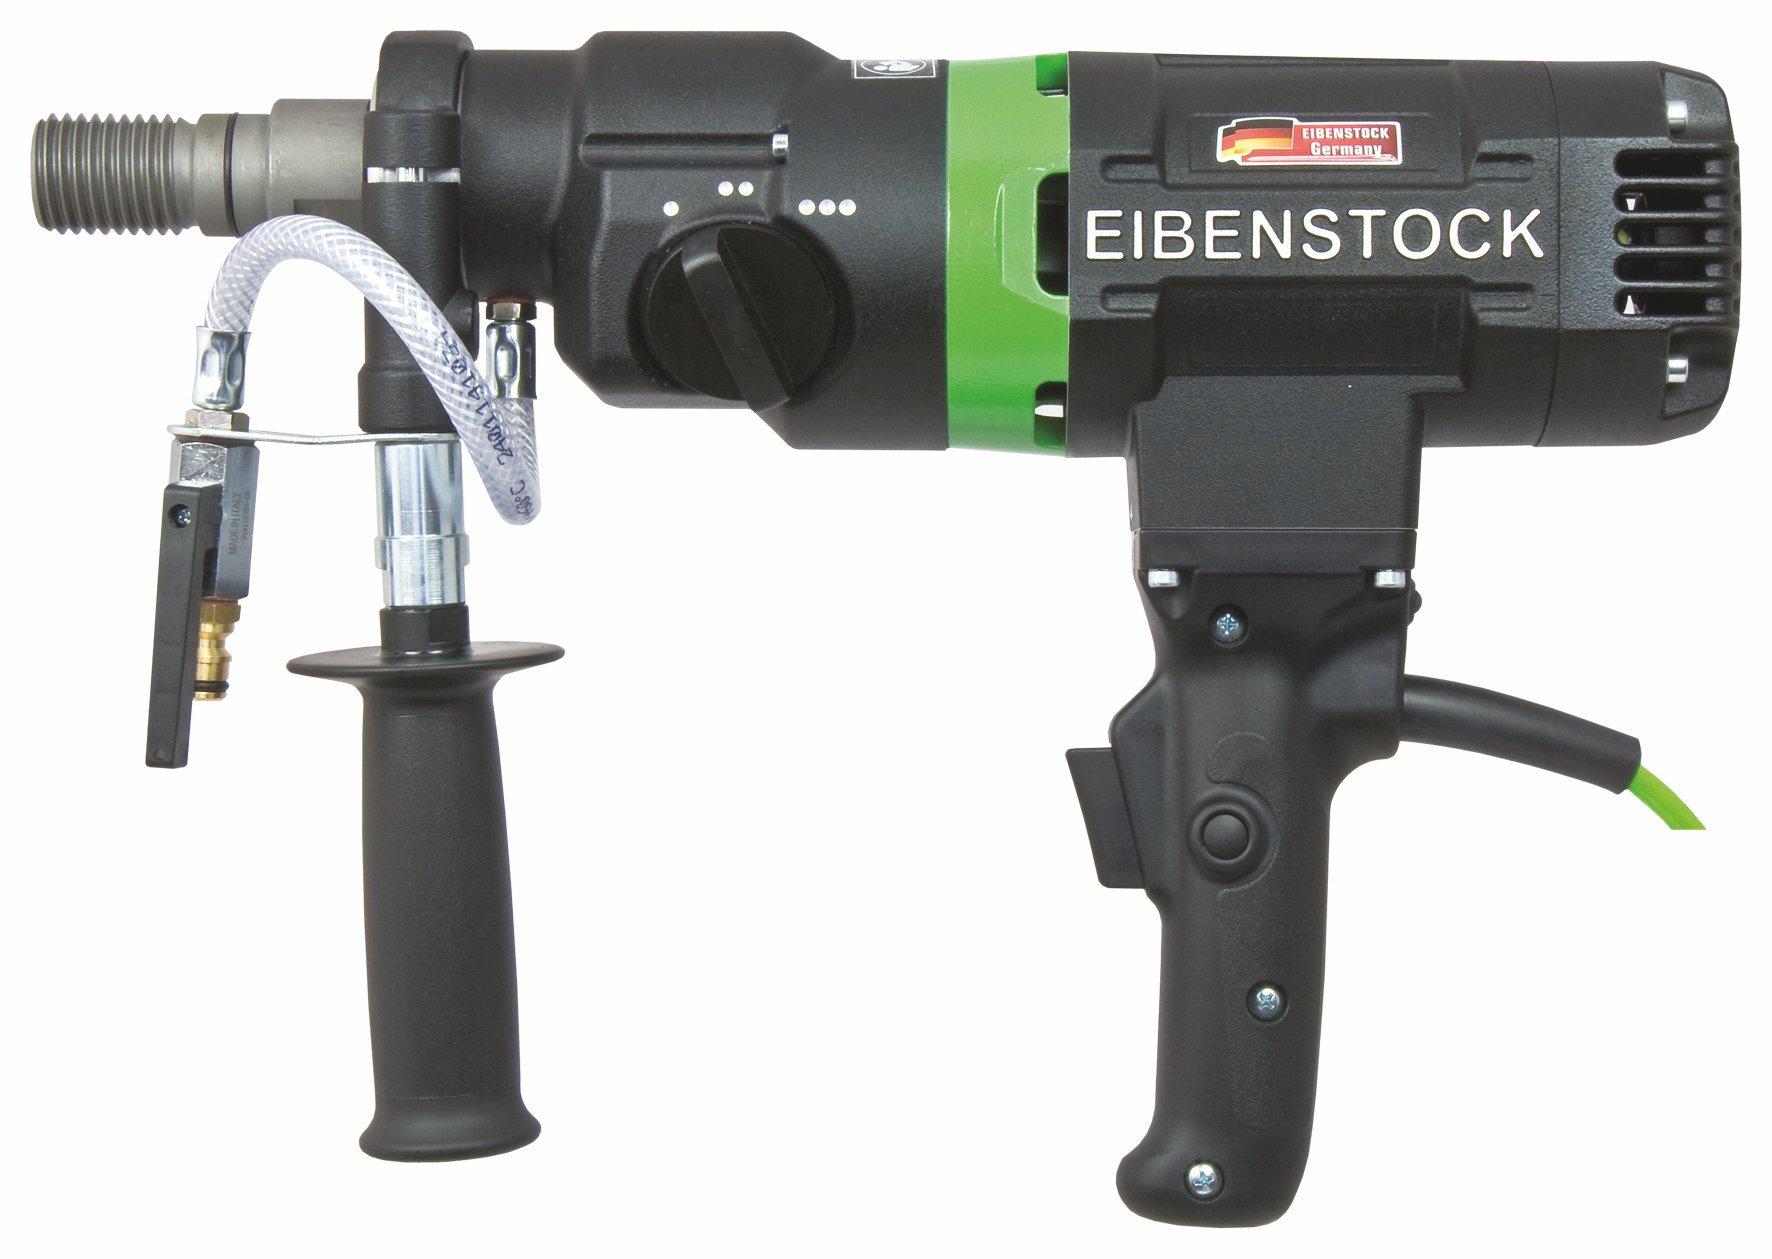 Eibenstock-0343P000-Diamant-Nass-Kernbohrmaschine-PLD-182